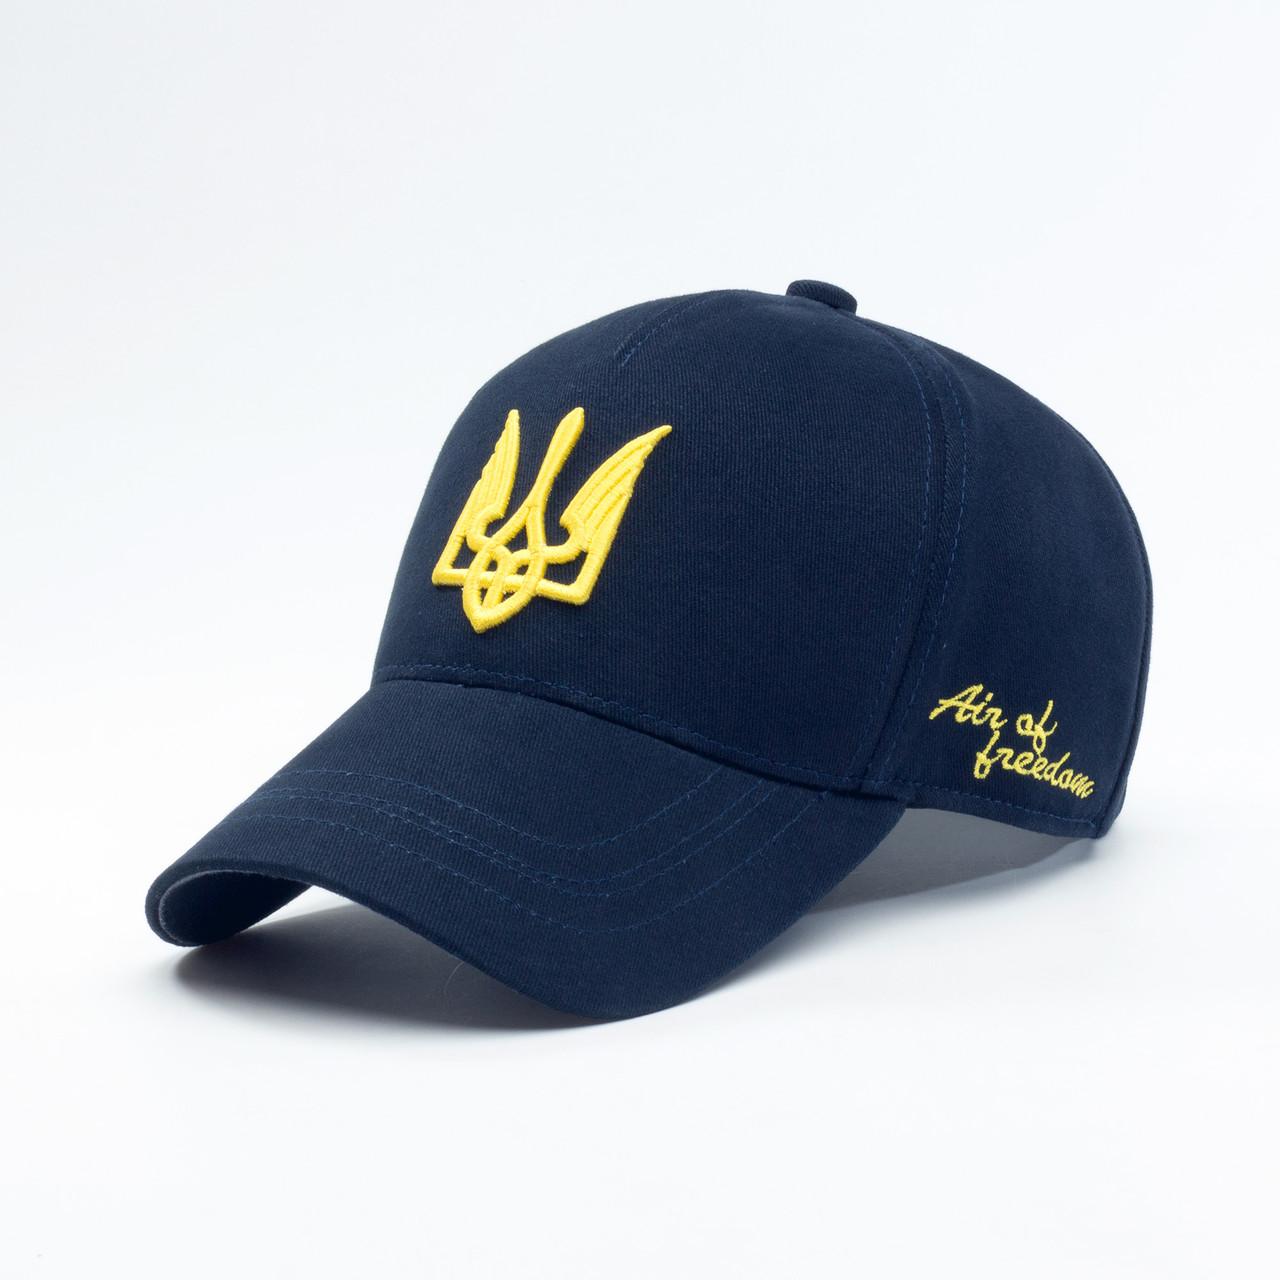 Купить Кепка бейсболка мужская INAL air of freedom S / 53-54 RU Синий 36753